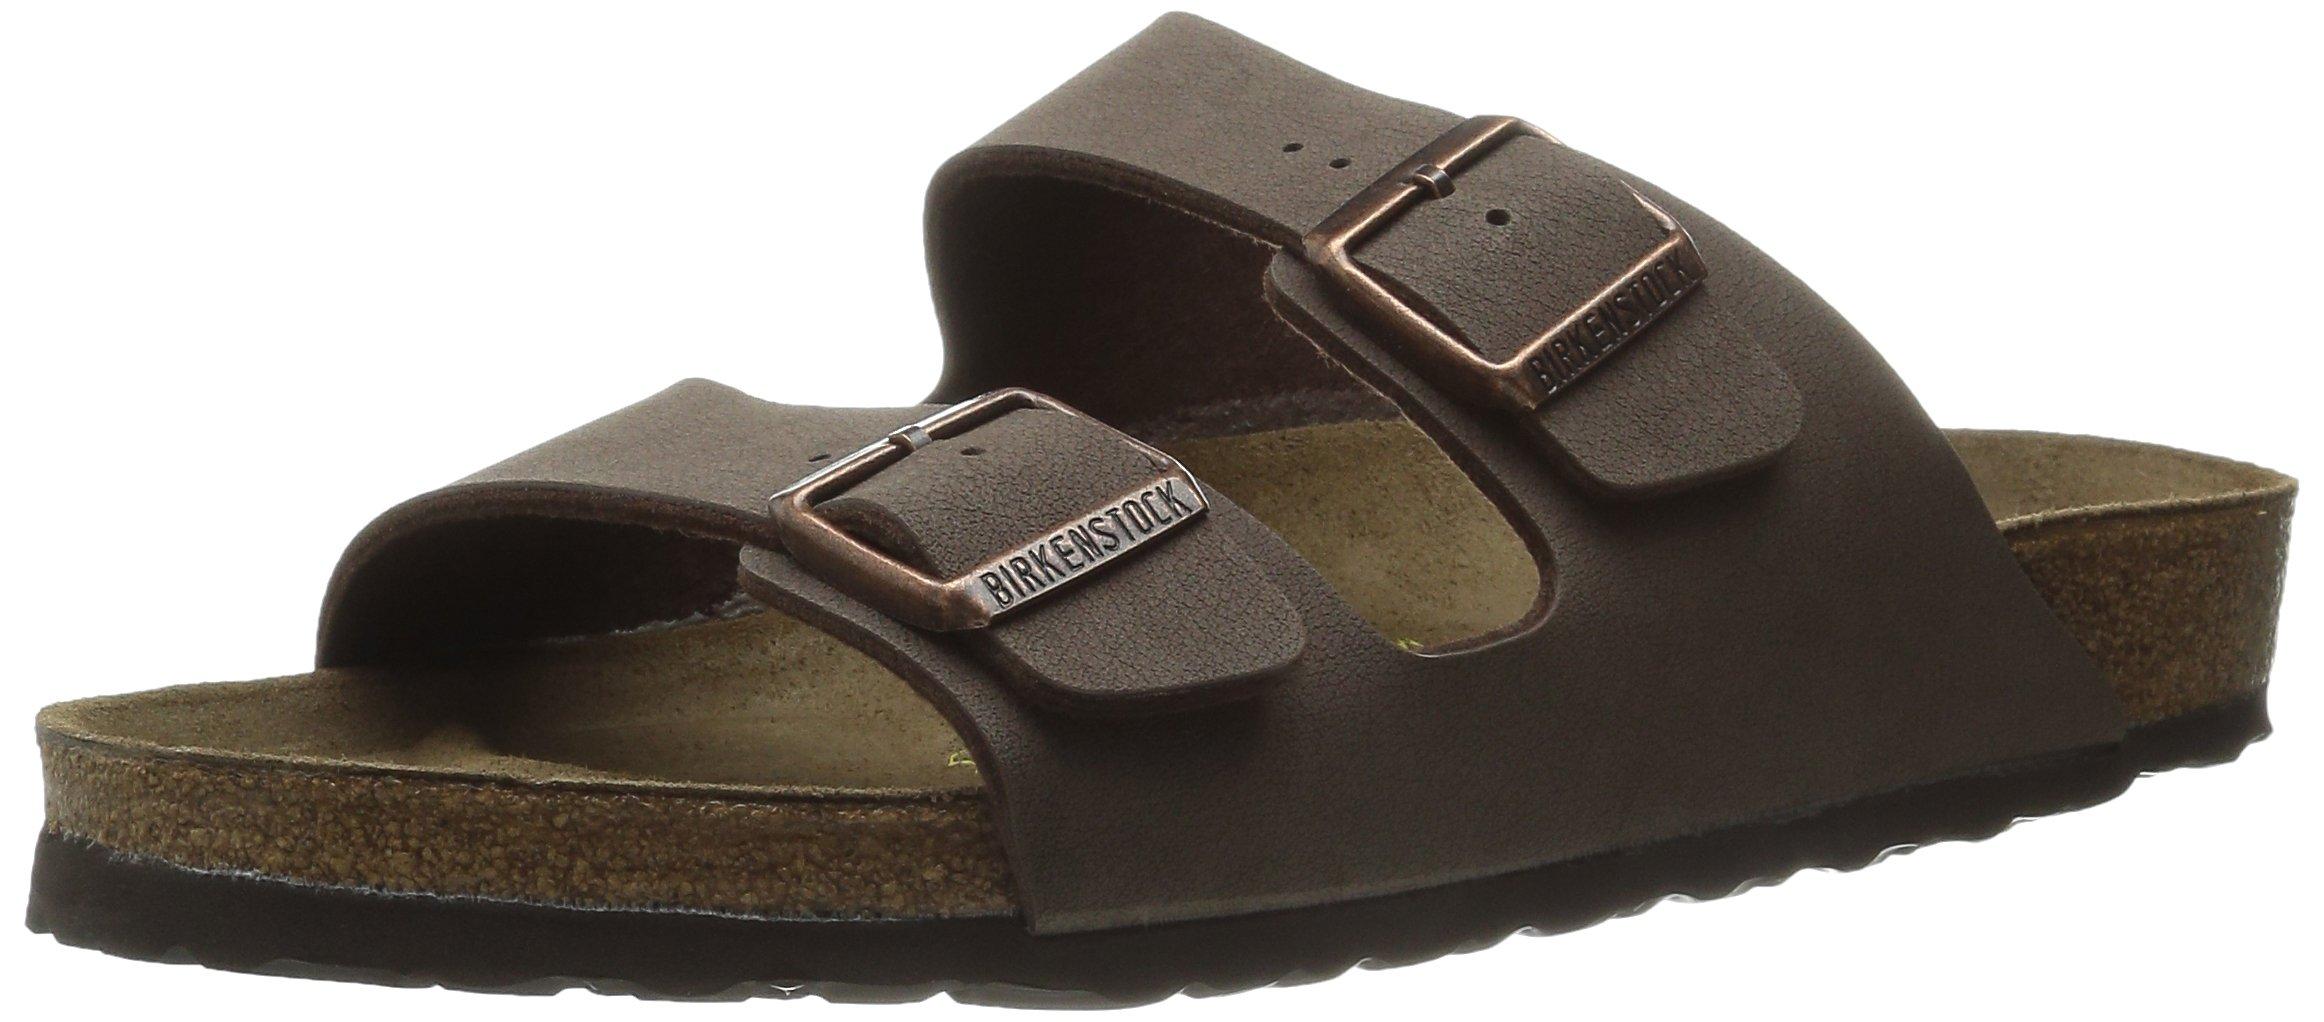 Birkenstock Unisex Arizona Sandal (38 M EU, Mocha Birkibuc)